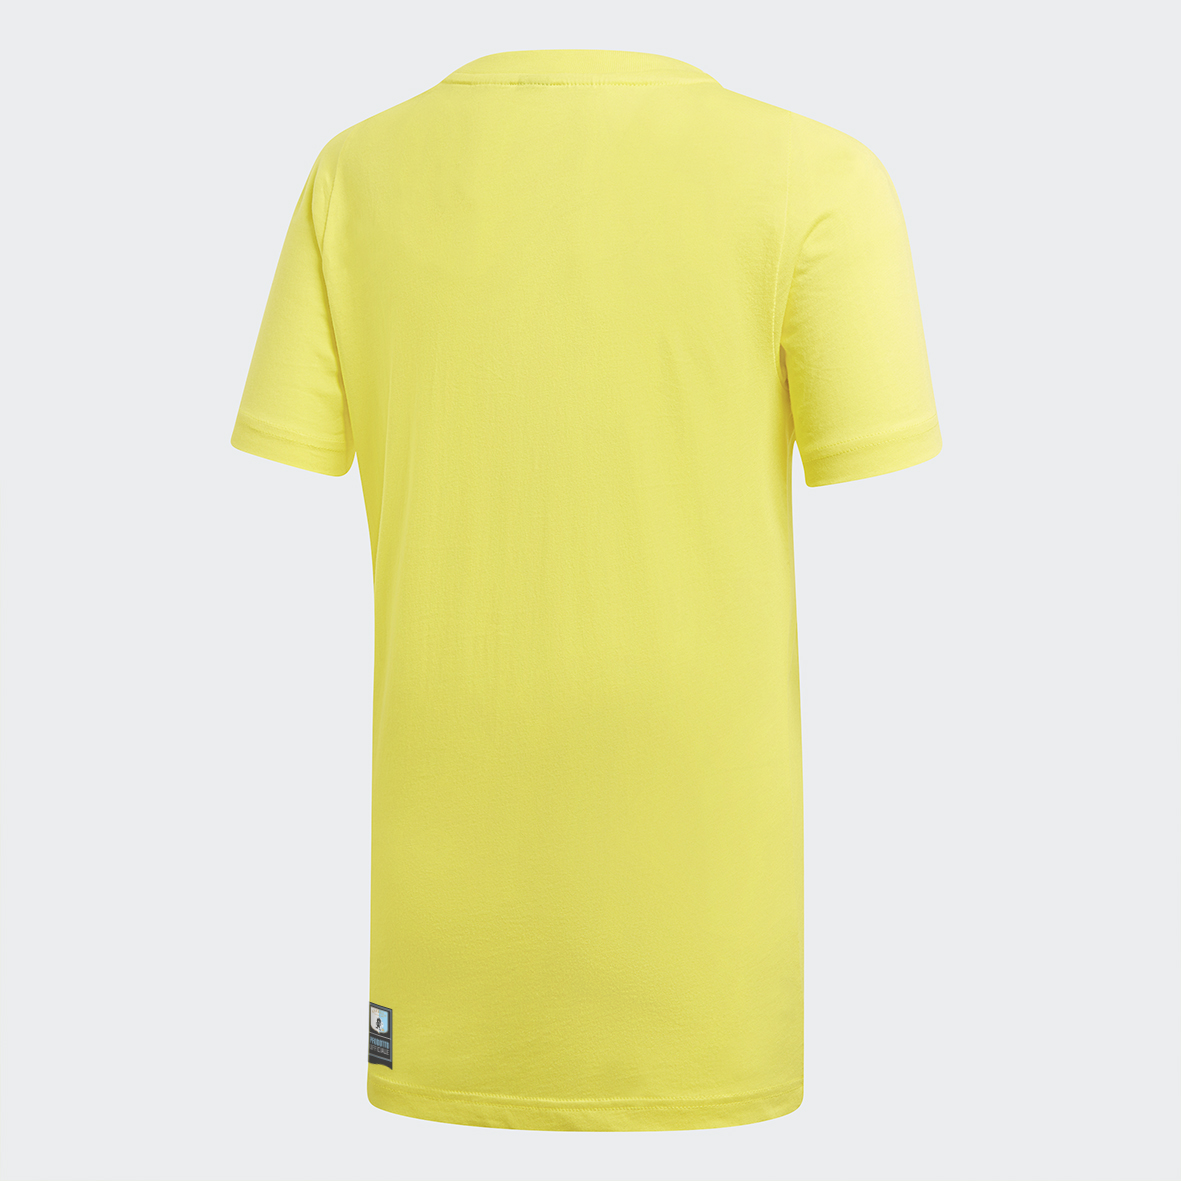 T-Shirt gialla con logo Adidas - Virtus Entella Store